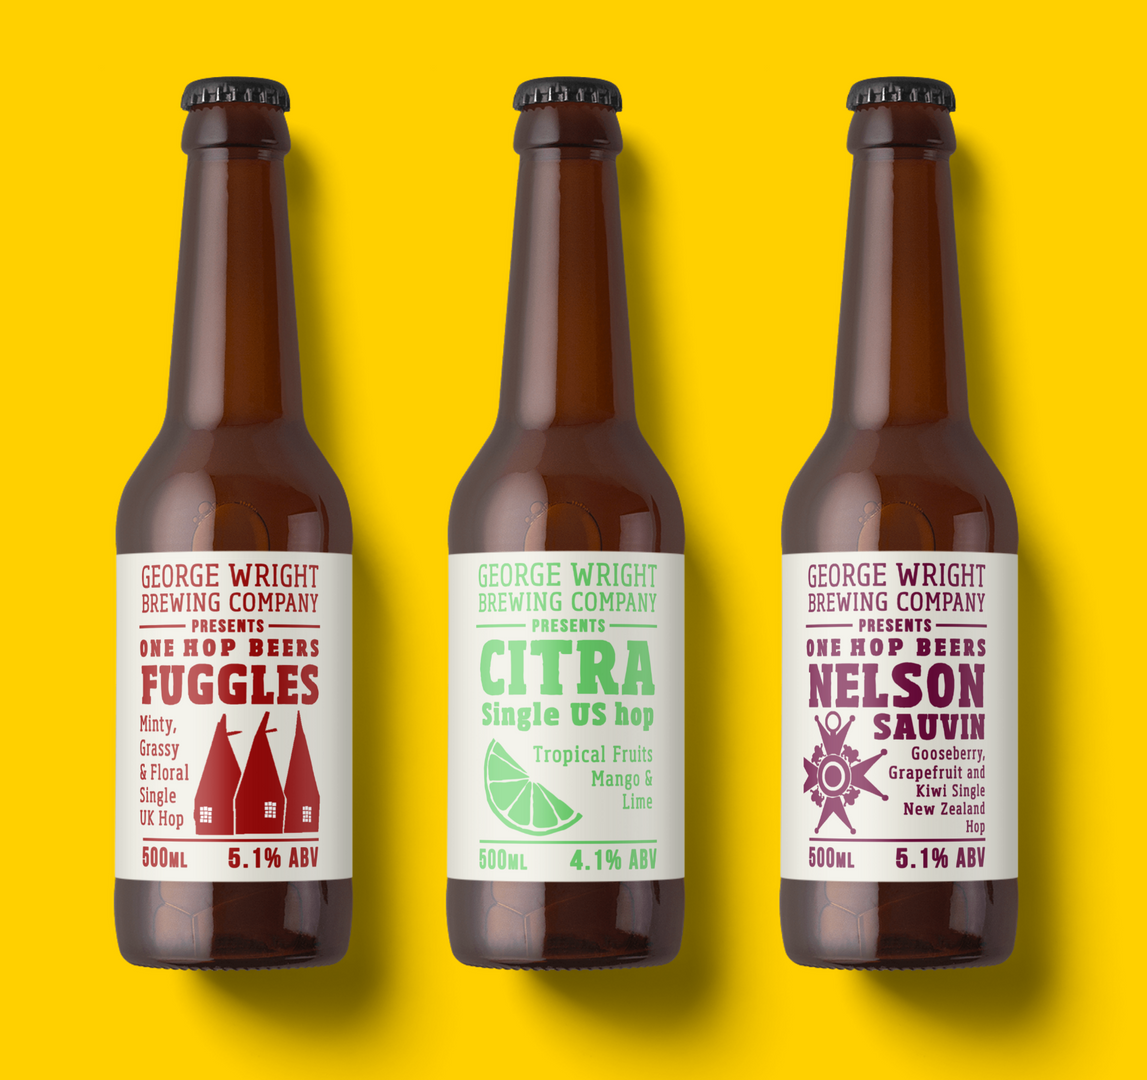 Limited edition labels on bottles